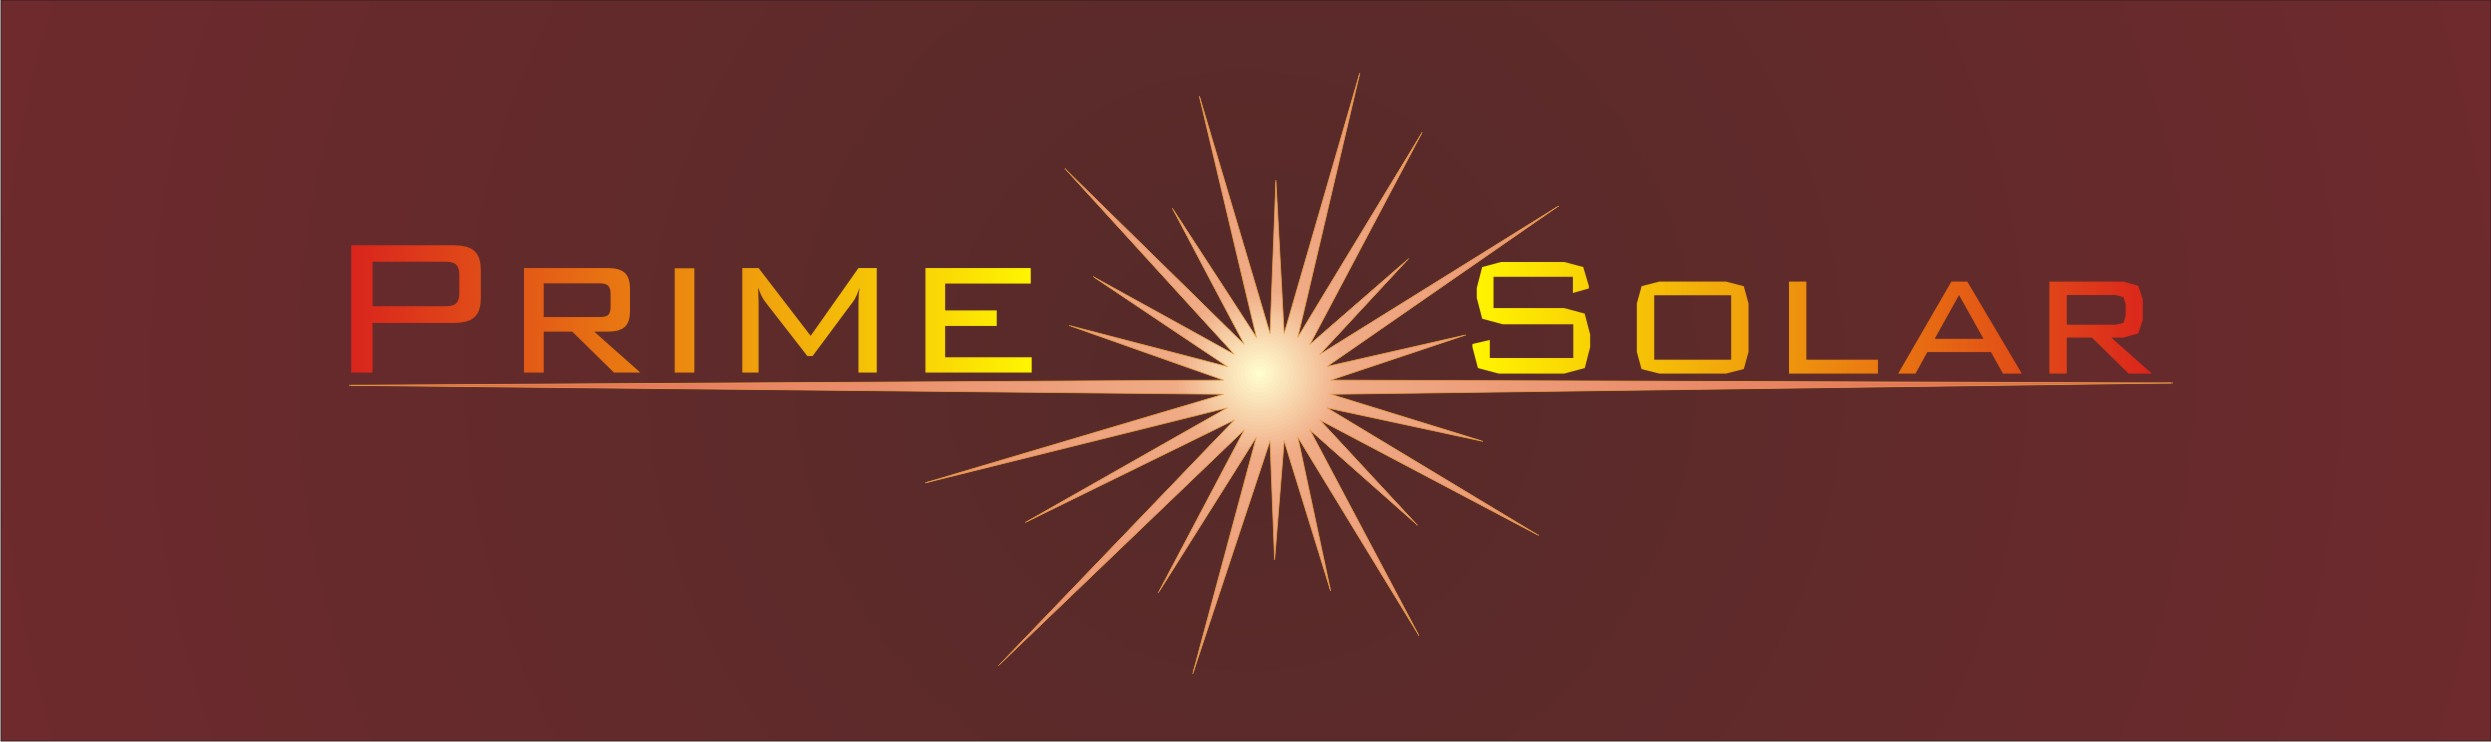 Логотип компании PrimeSolar [UPD: 16:45 15/12/11] фото f_4ef1edafc25a6.jpg